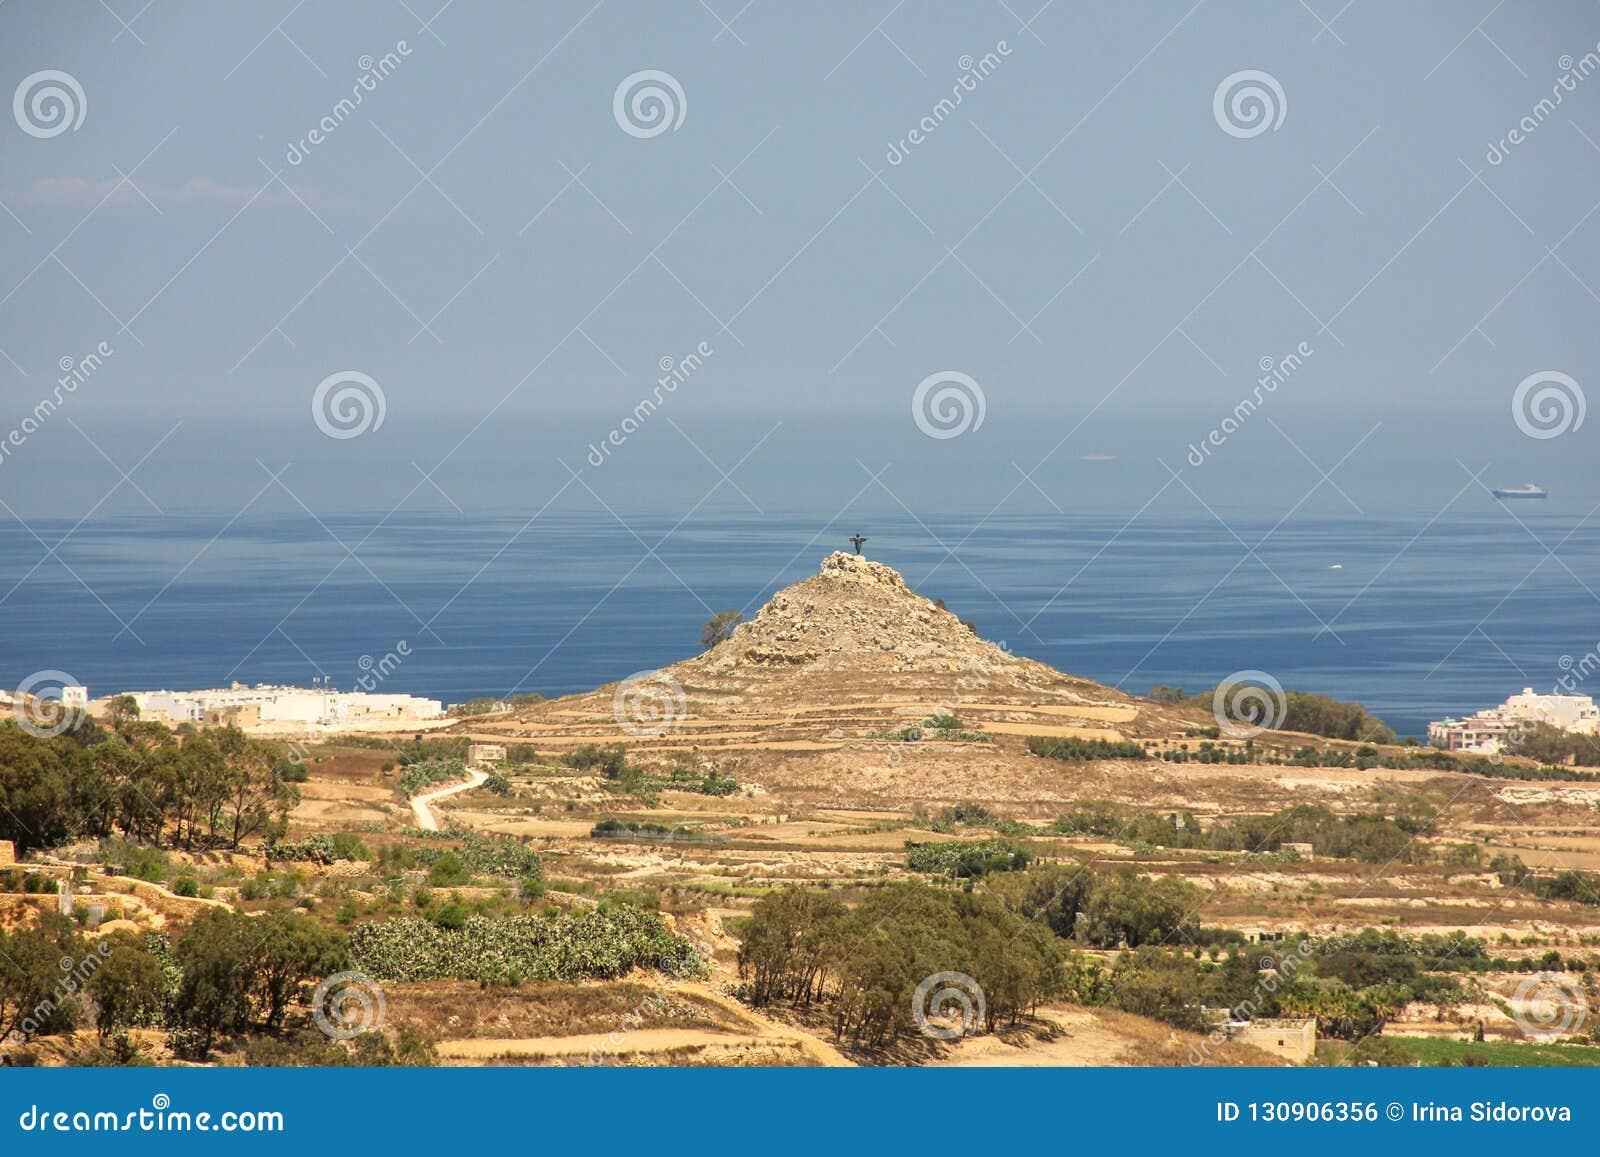 Estátua de Cristo o salvador na parte superior do monte no fundo do mar azul infinito